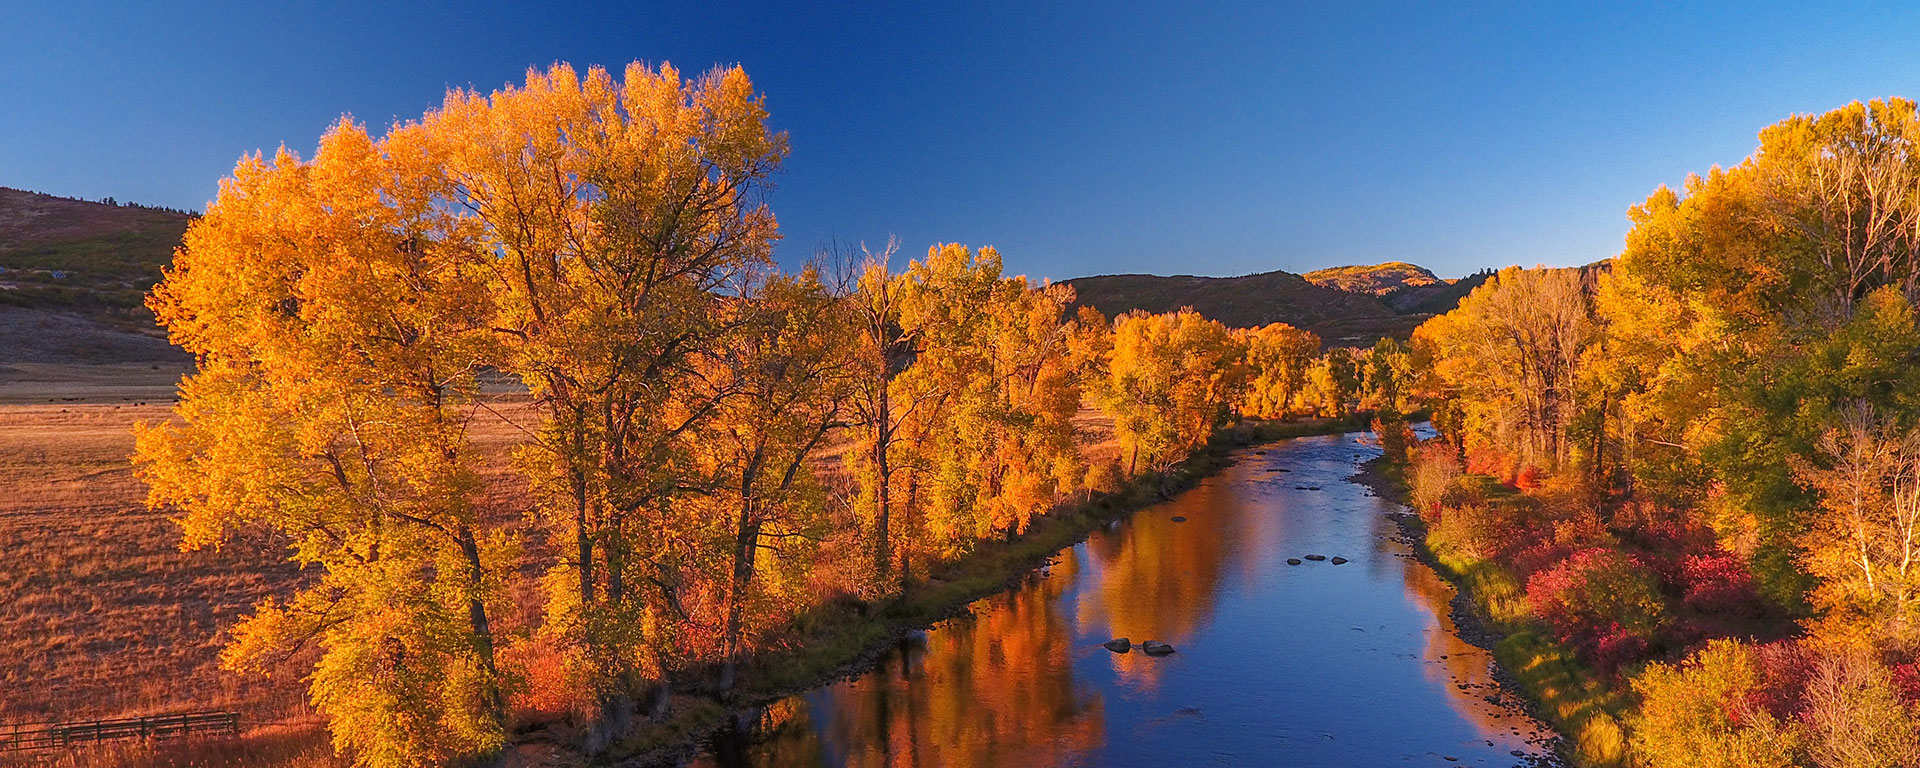 Steamboat Springs, Colorado Healthcare - Hospitals - Clinics